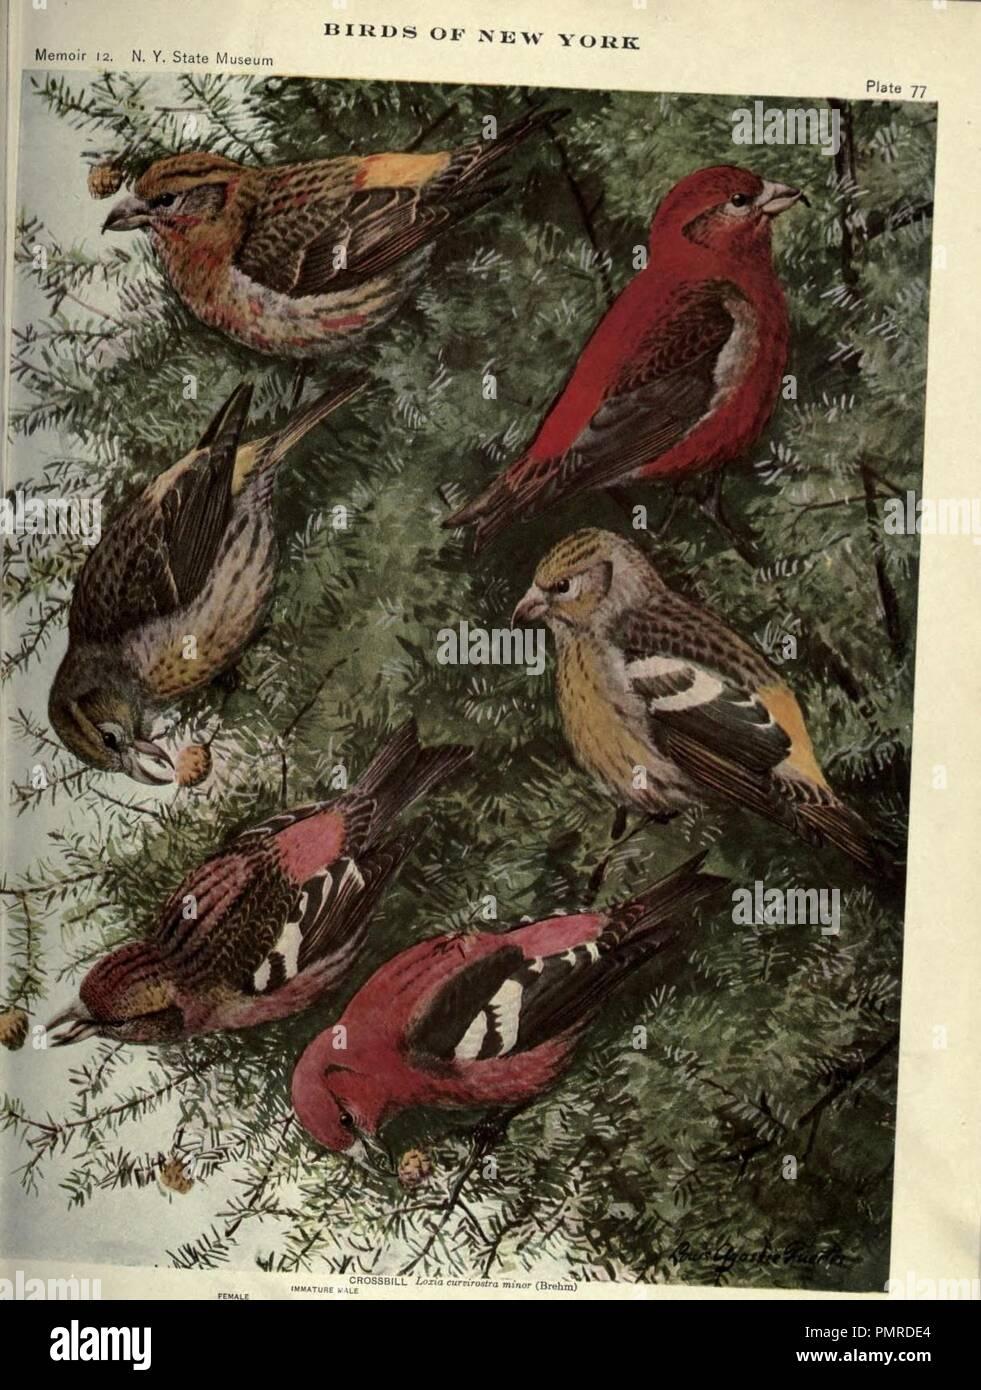 Birds of New York (Plate 77) - Stock Image